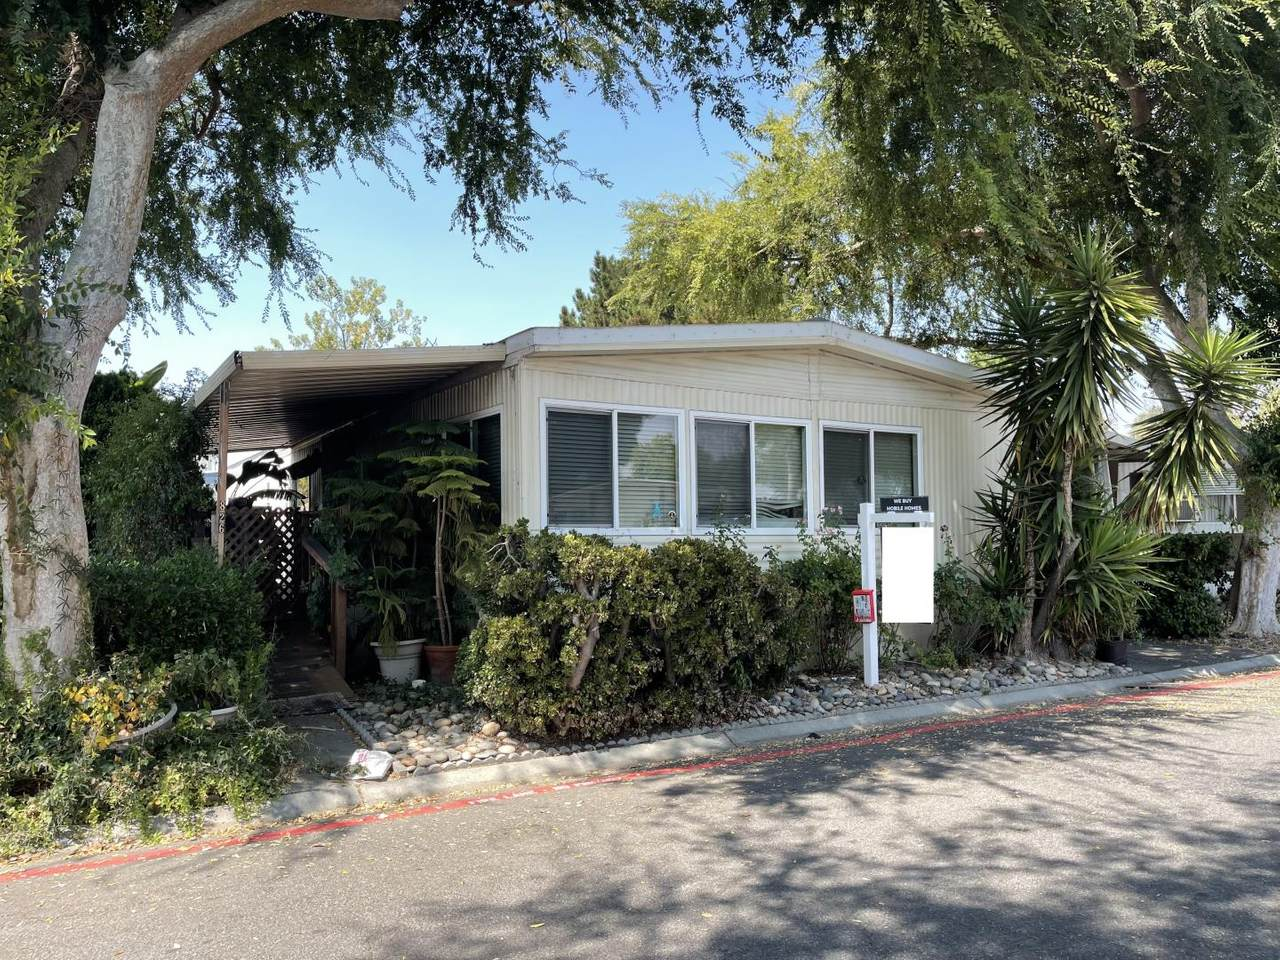 826 Spindrift Ave 826 - Photo 1